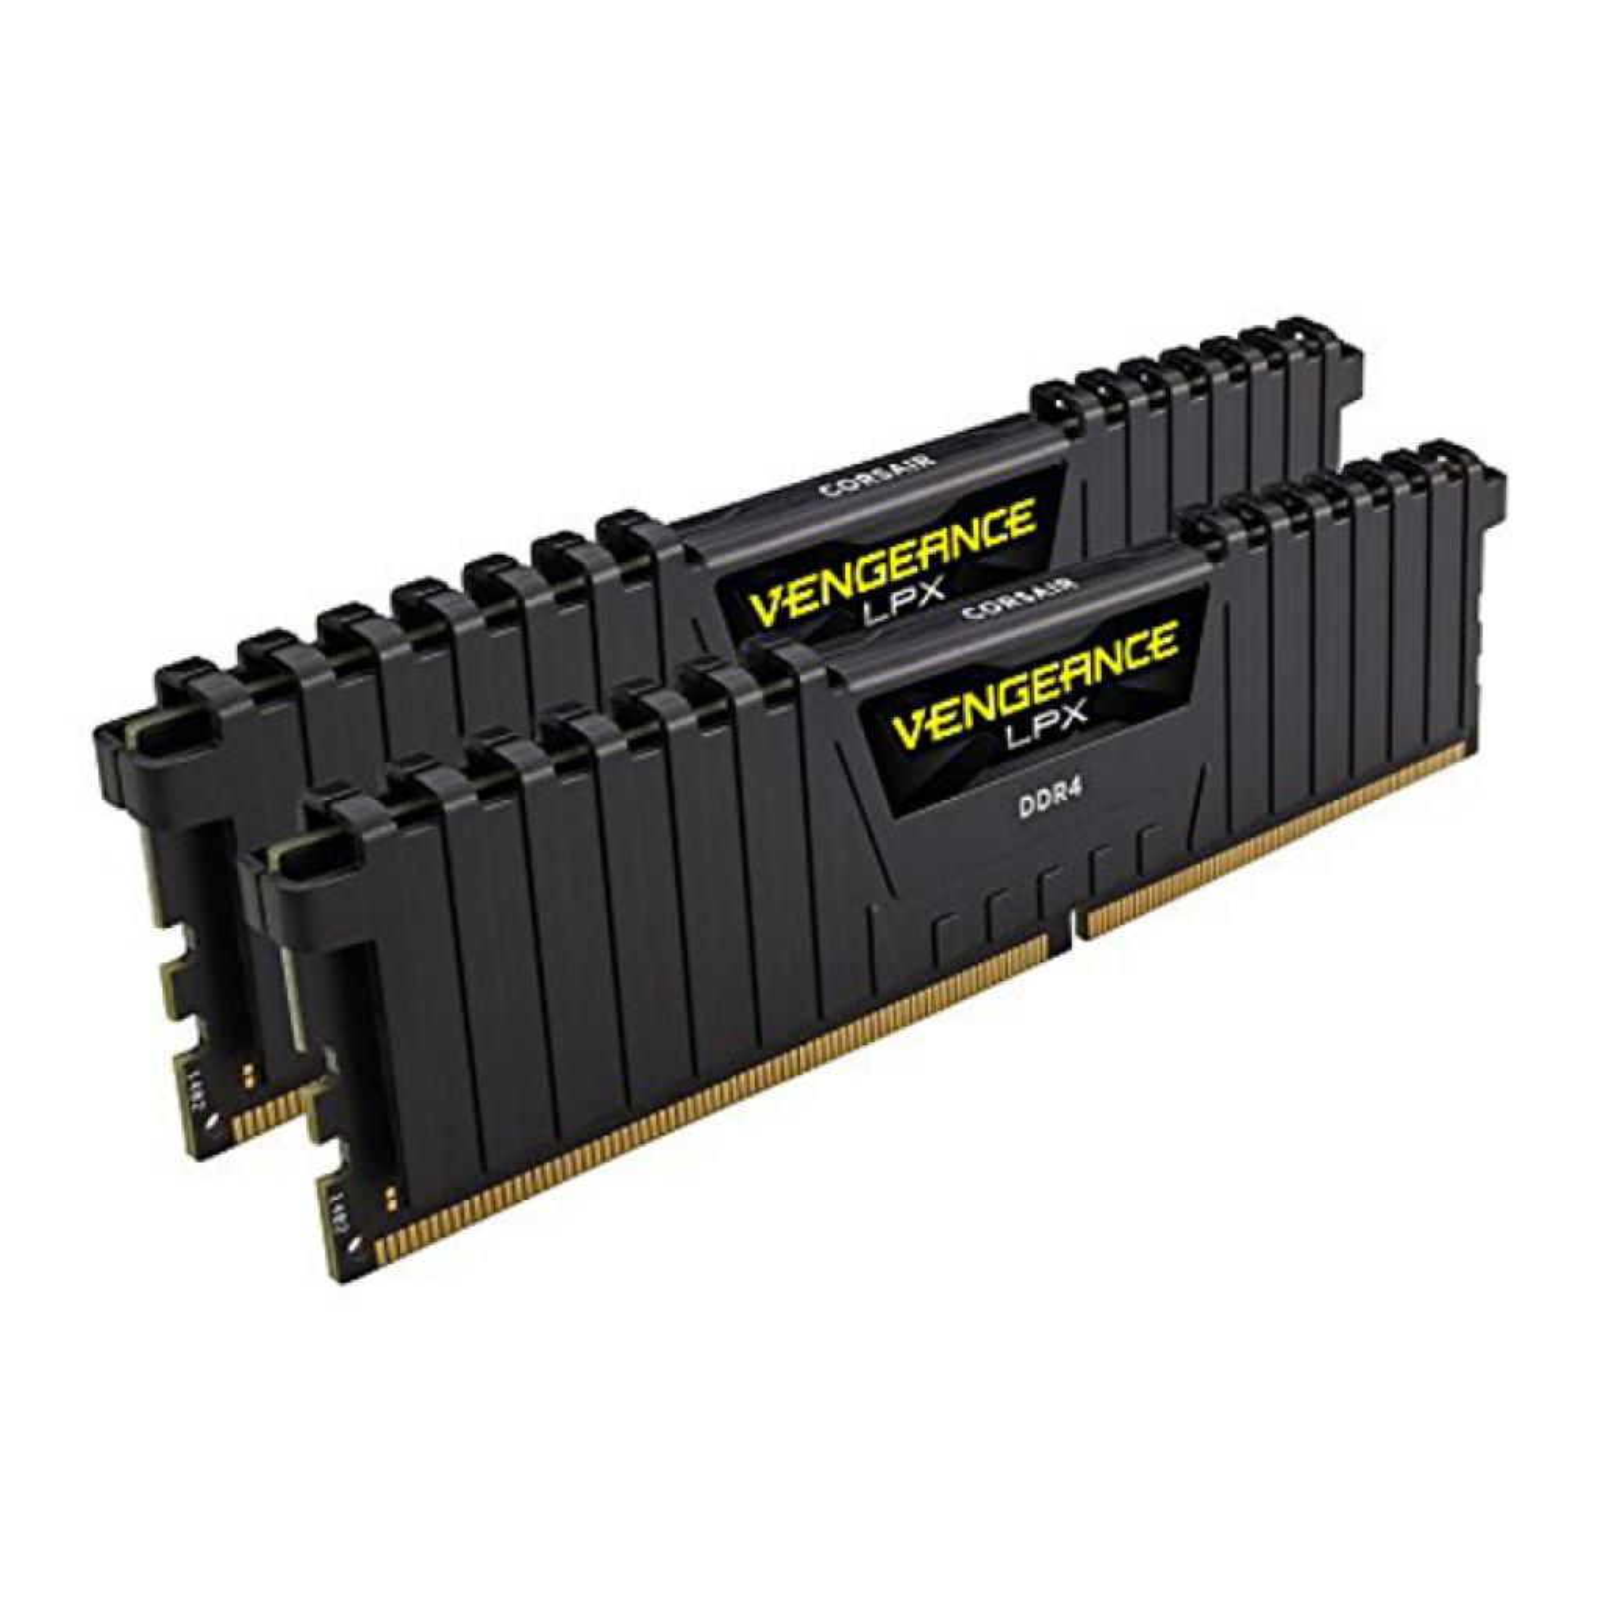 Модуль памяти для компьютера DDR4 16GB (2x8GB) 3000 MHz Vengeance LPX Black CORSAIR (CMK16GX4M2B3000C15) изображение 3